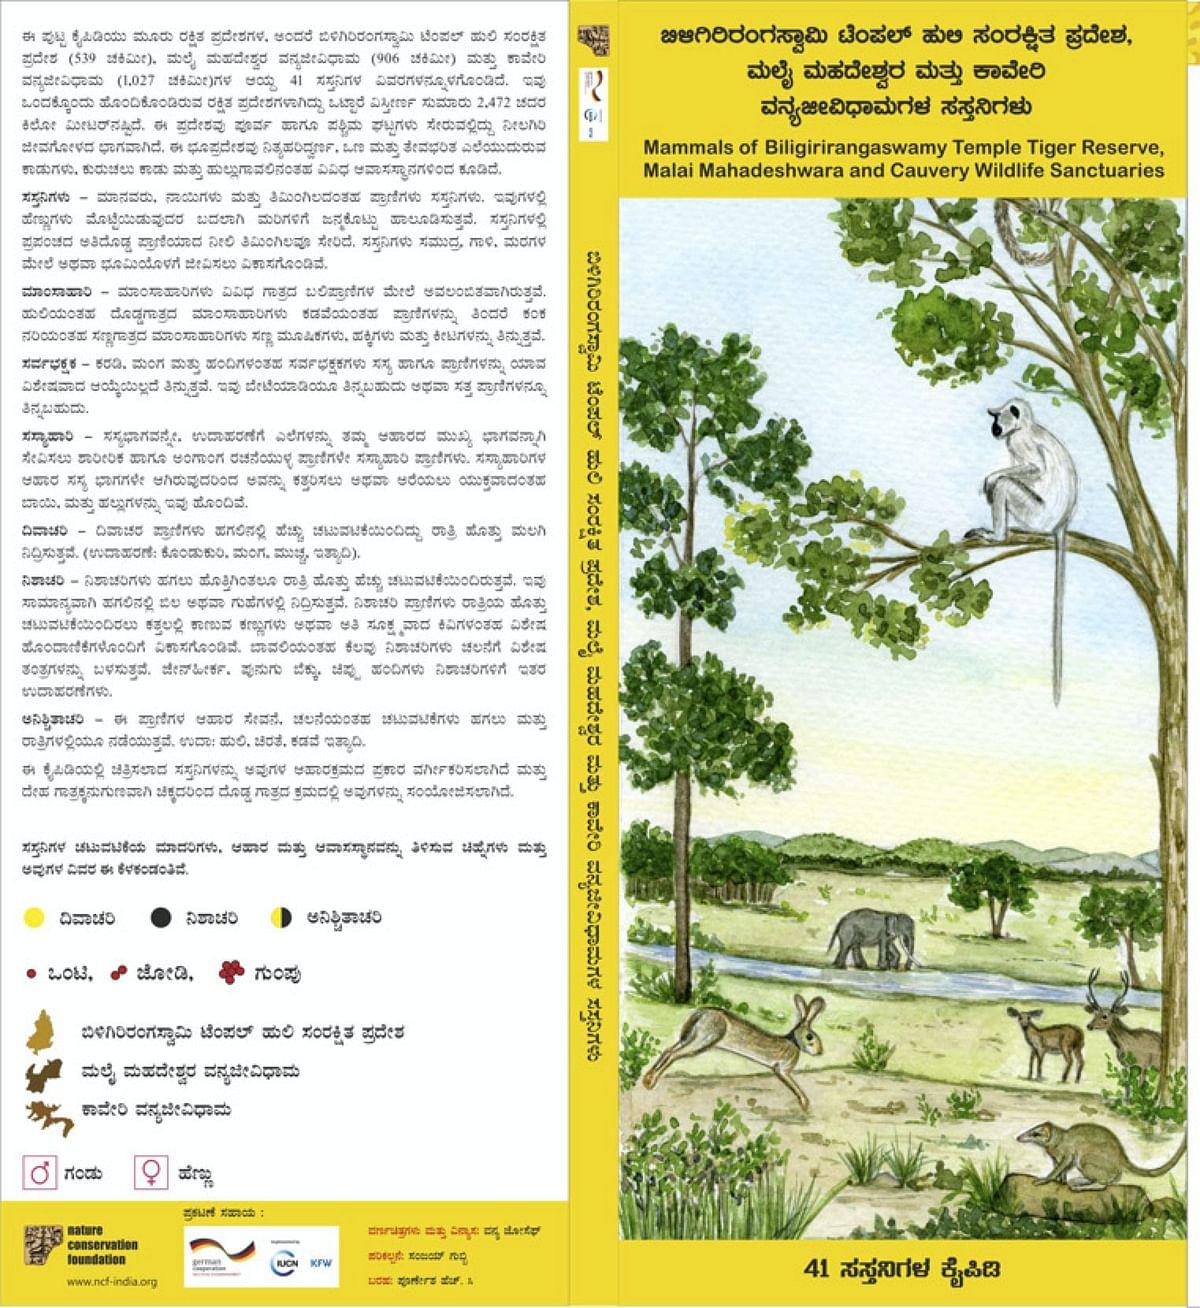 Mammals of Biligirirangaswamy Temple Tiger Reserve, Malai Mahadeshwara and Cauvery Wildlife Sanctuaries - A bilingual pocket guide